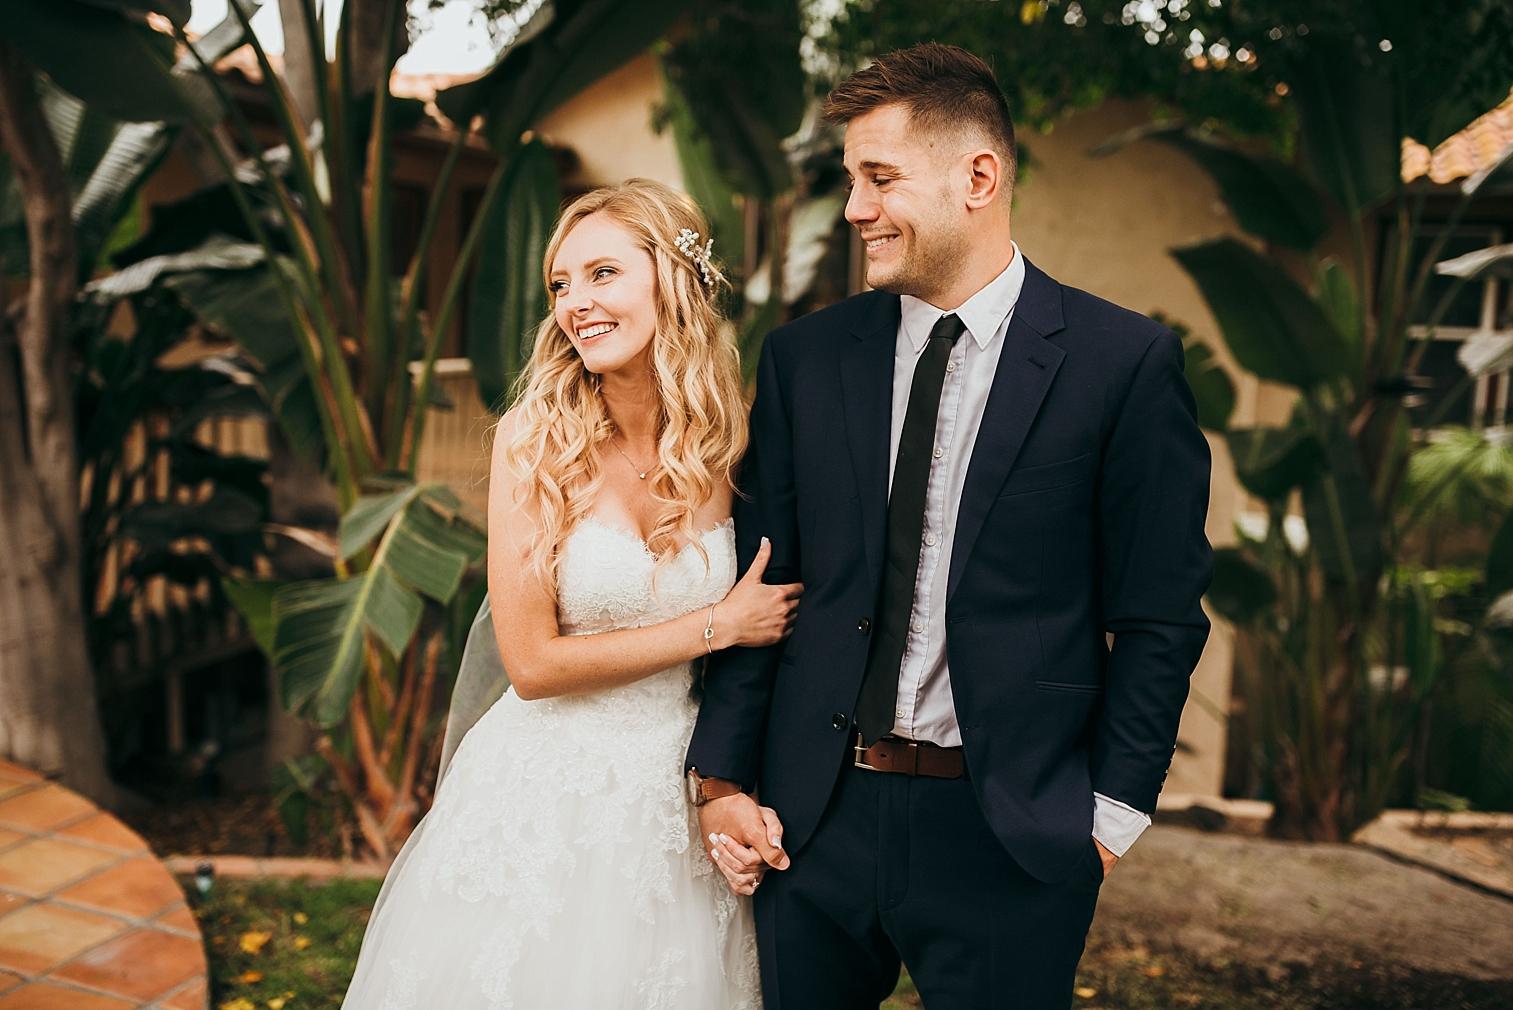 San-Diego-Backyard-Wedding_0035.jpg